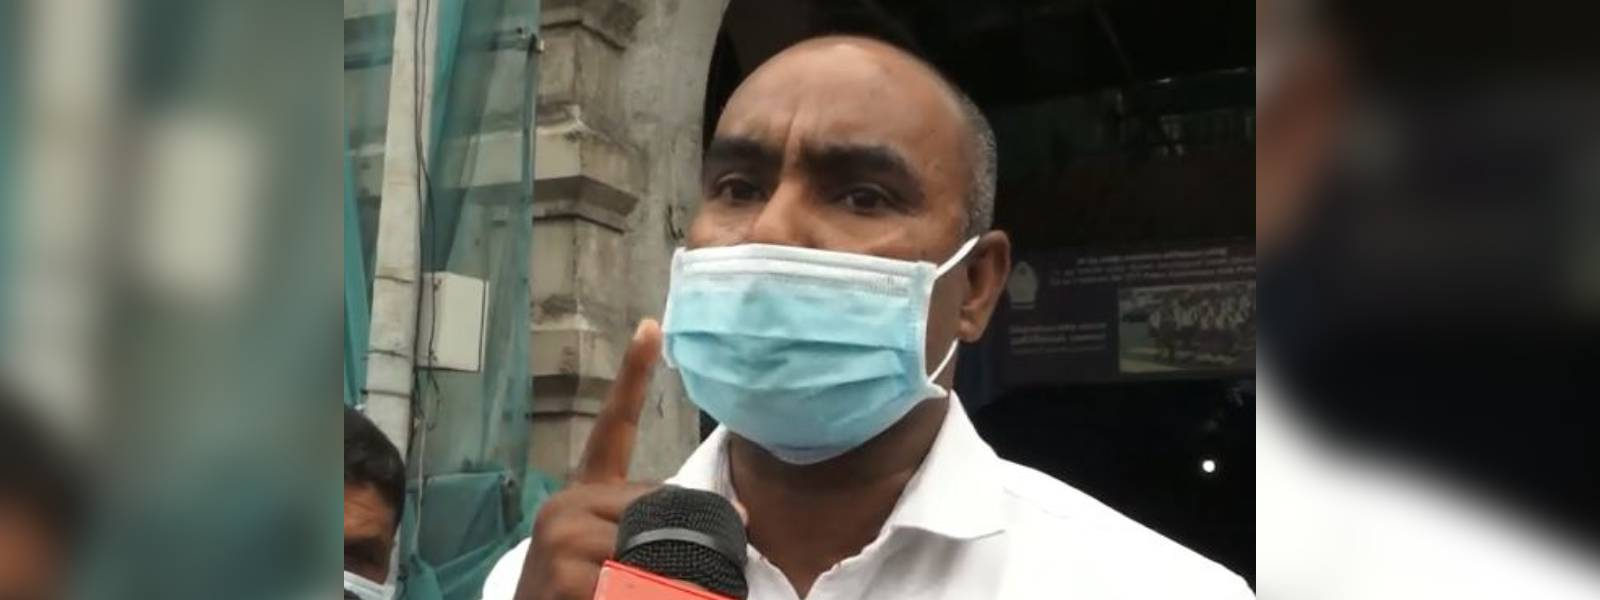 Port unions seeks probe into procurement of masks